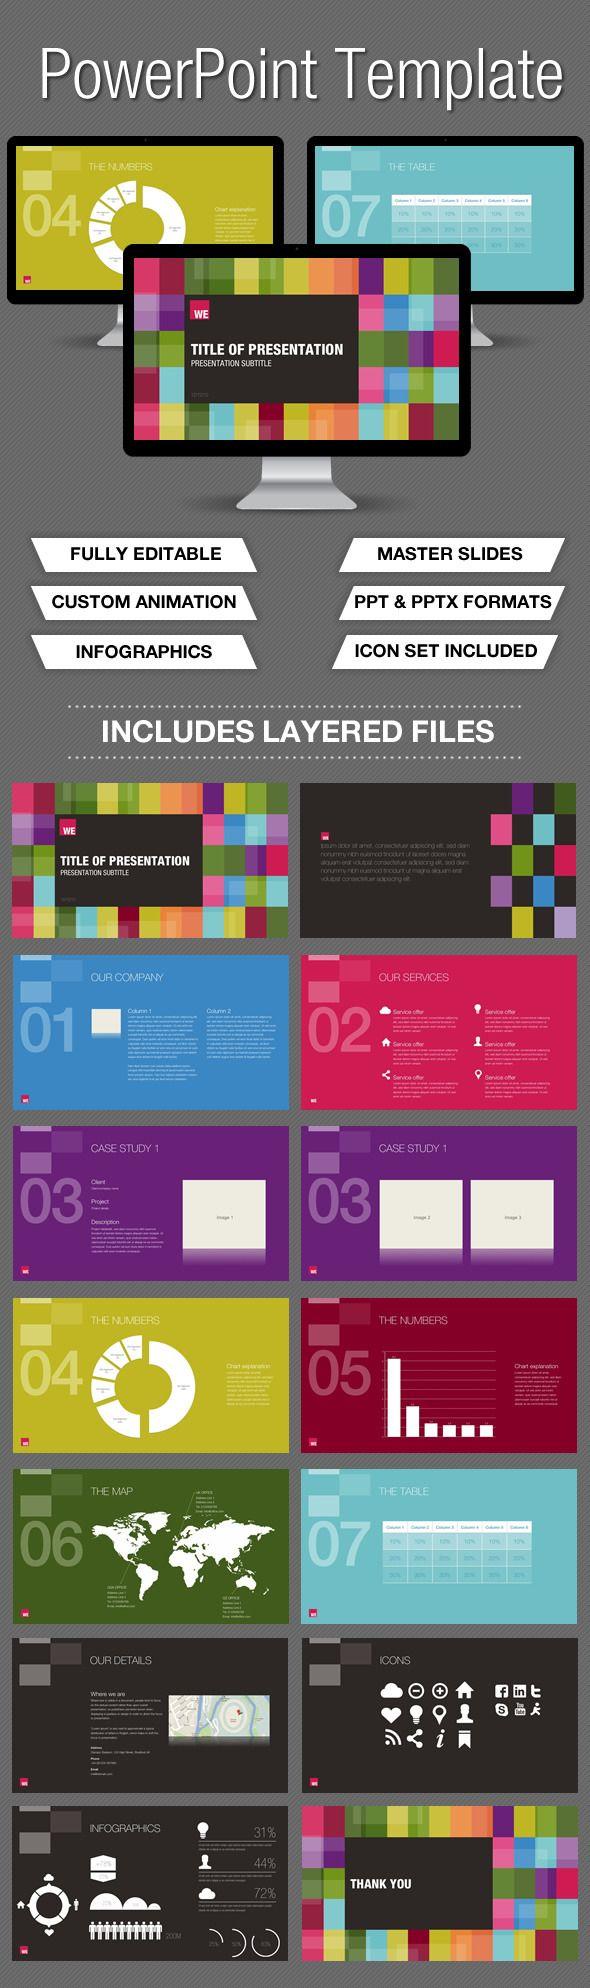 19 best powerpoint images on pinterest display folder